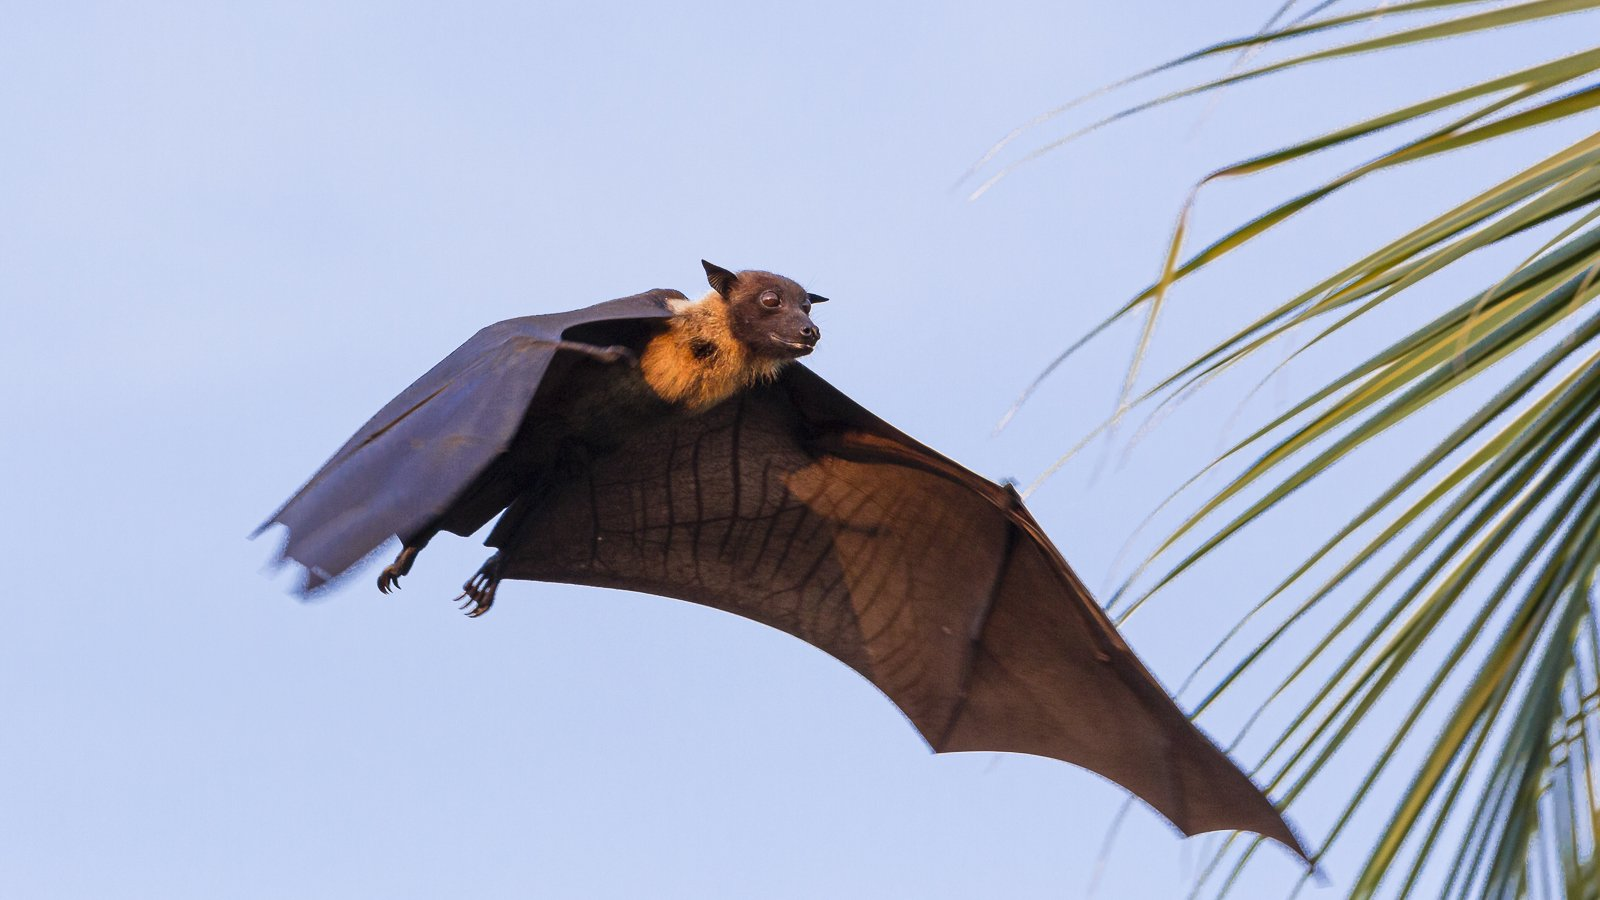 Fruit Bat or Flying Fox